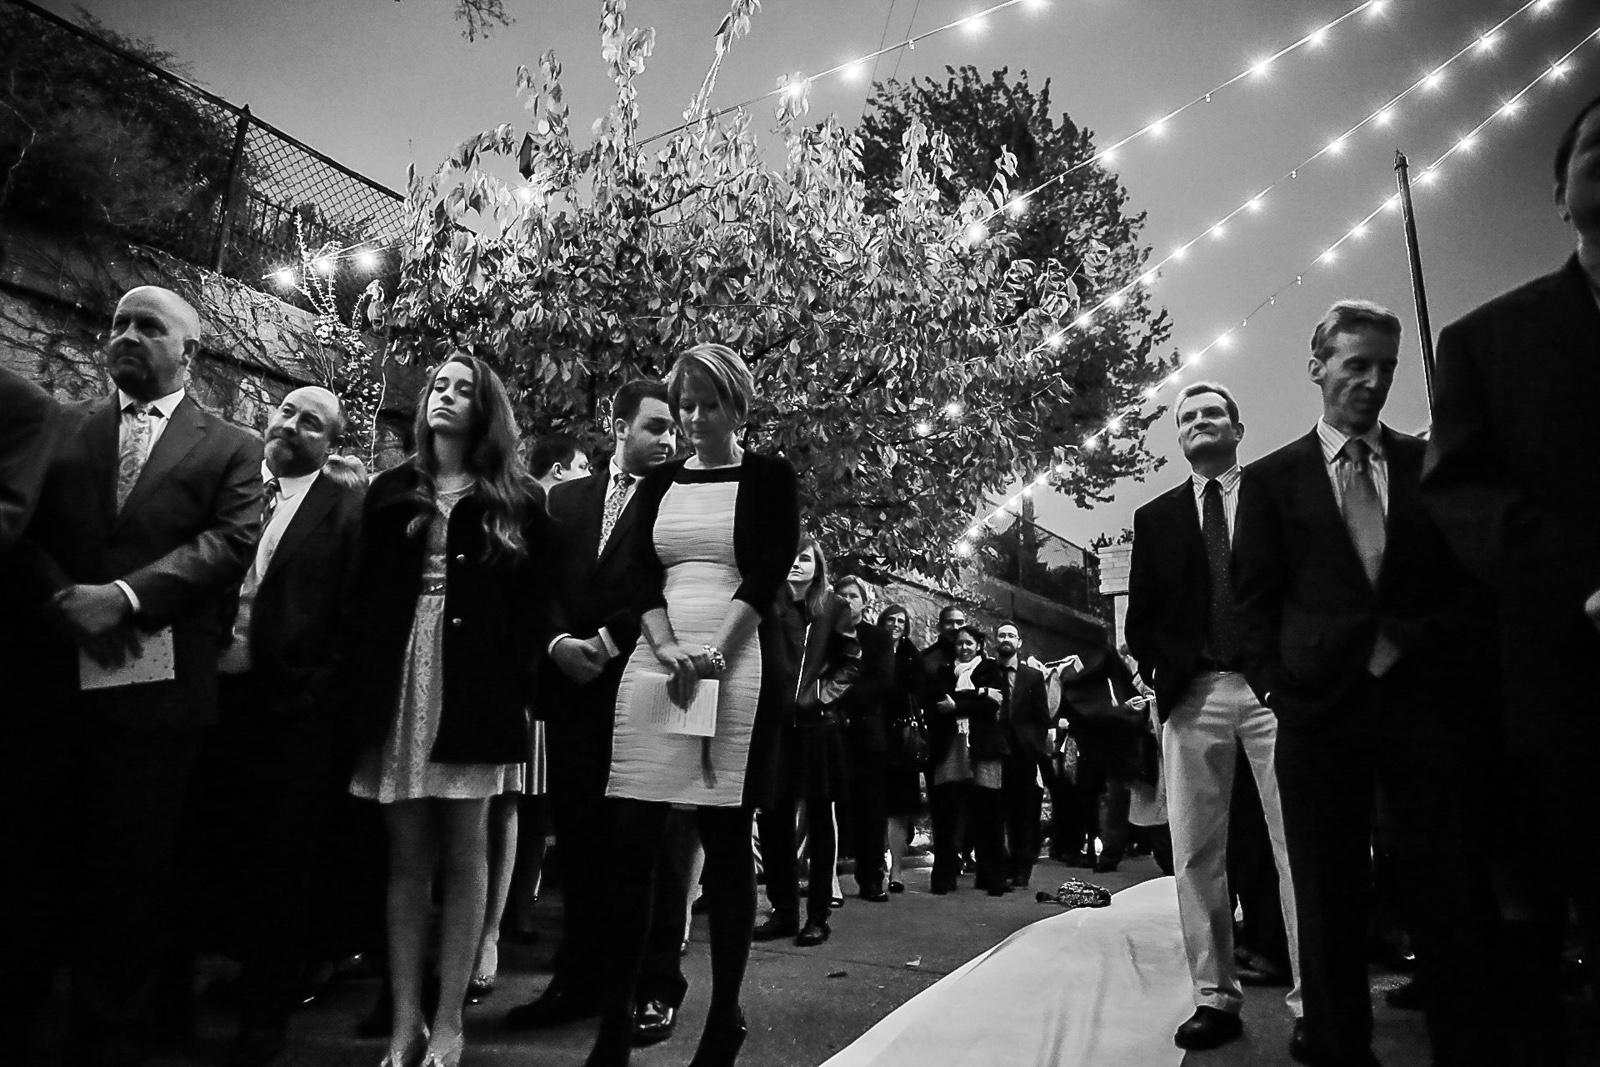 Oldani Photography-St Louis-Wedding Photos-wedding photographer-wedding party-outdoor wedding-Mad Art Gallery-reception-rain_20141122_18324600.jpg